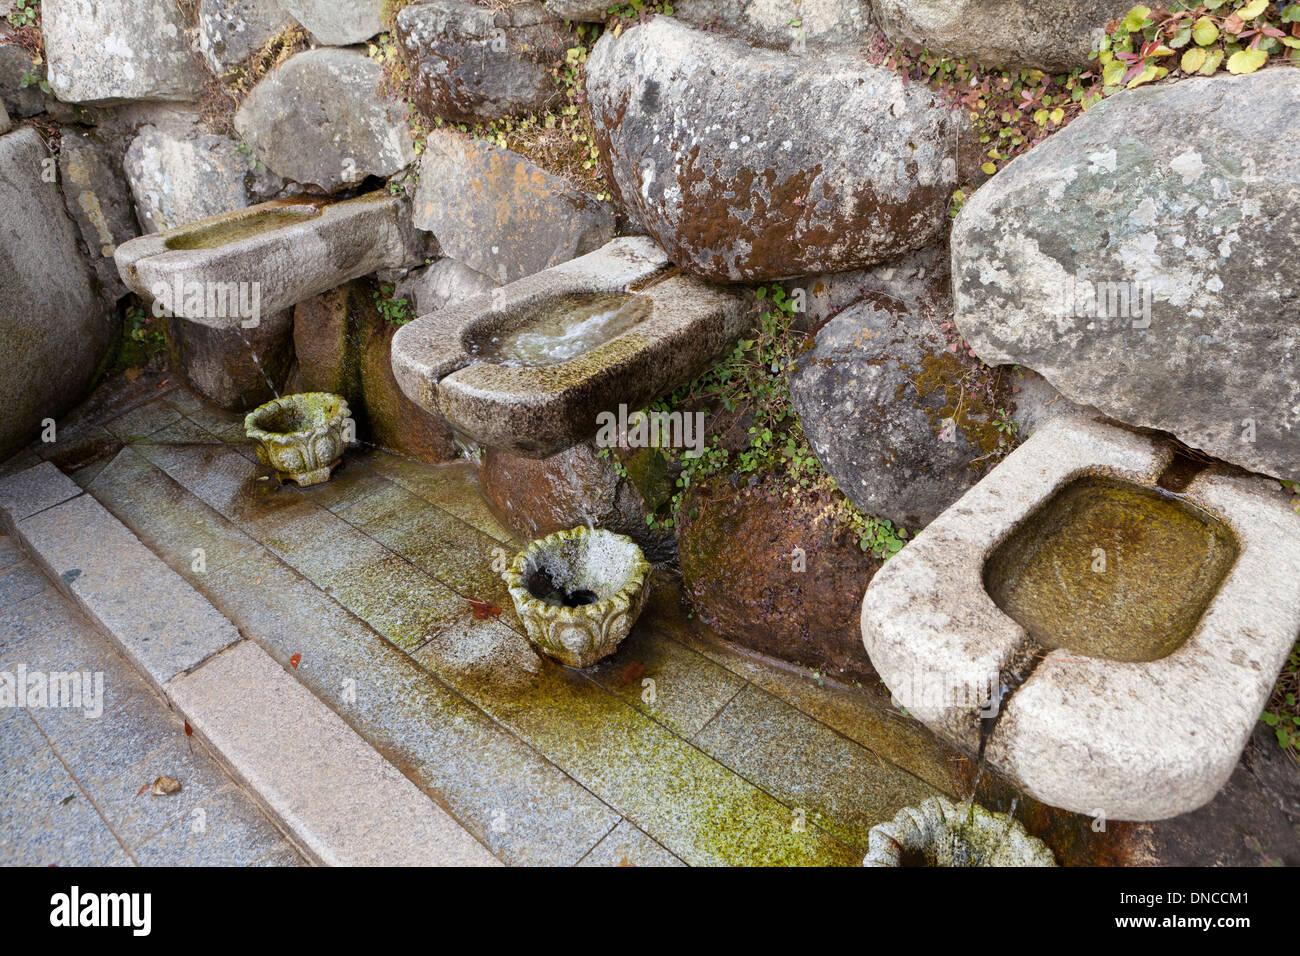 Natural spring water sink at Buddhist temple - Gyeongju, South Korea - Stock Image